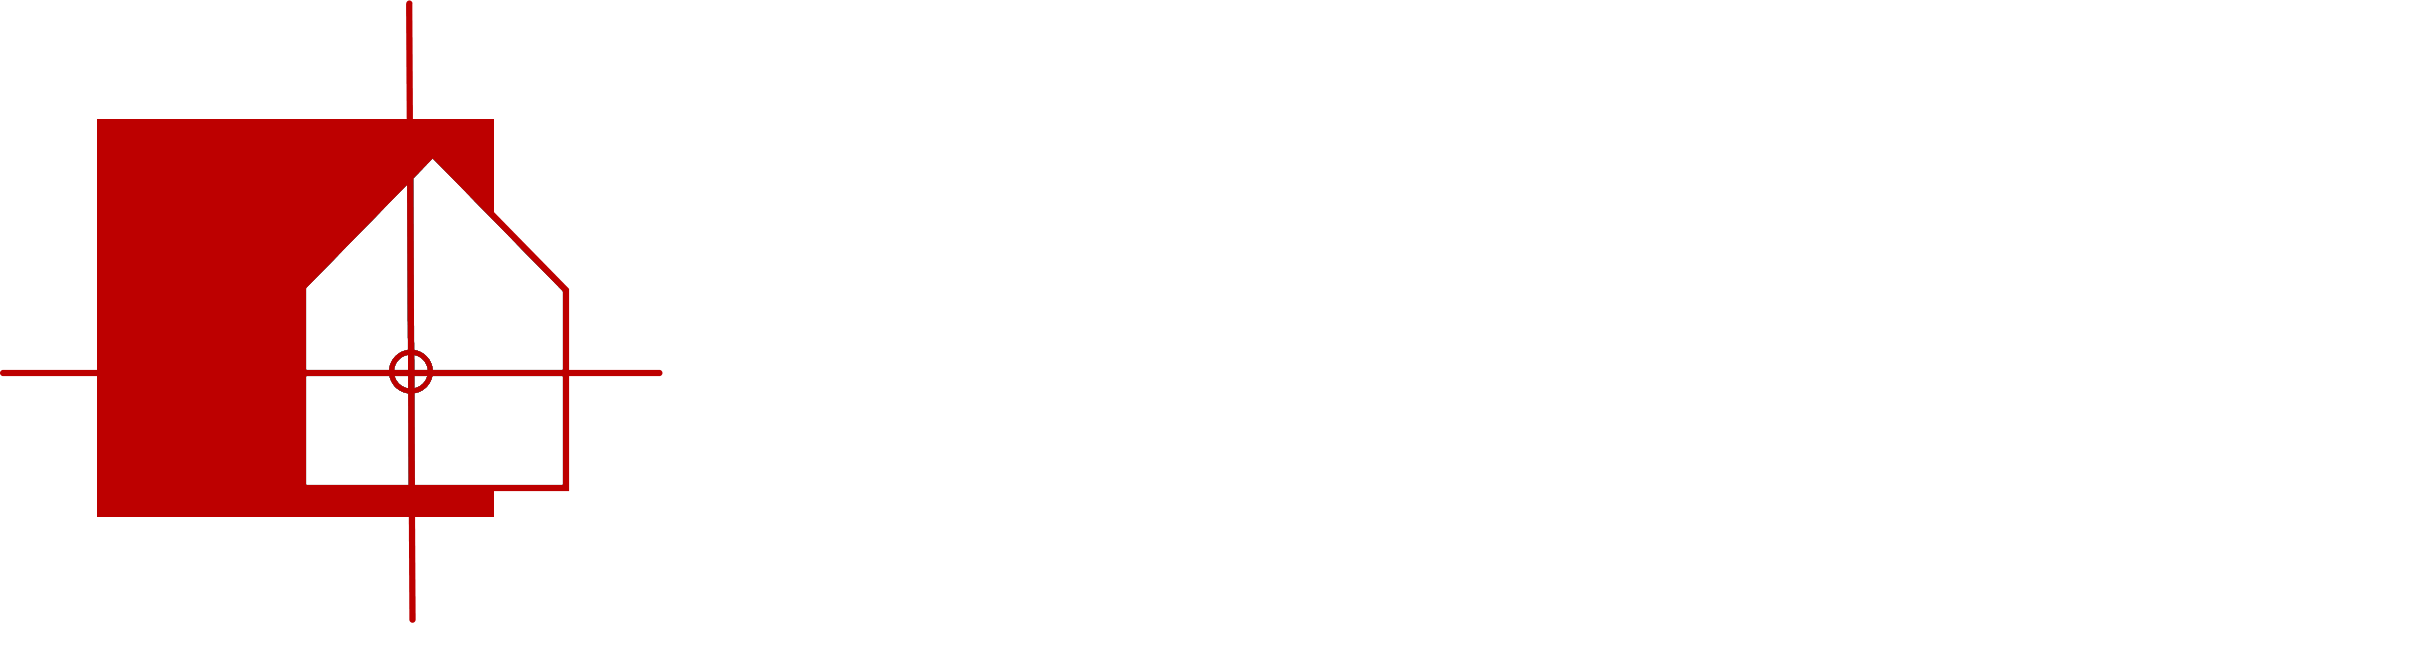 Planungsbüro Stegmann & Partner